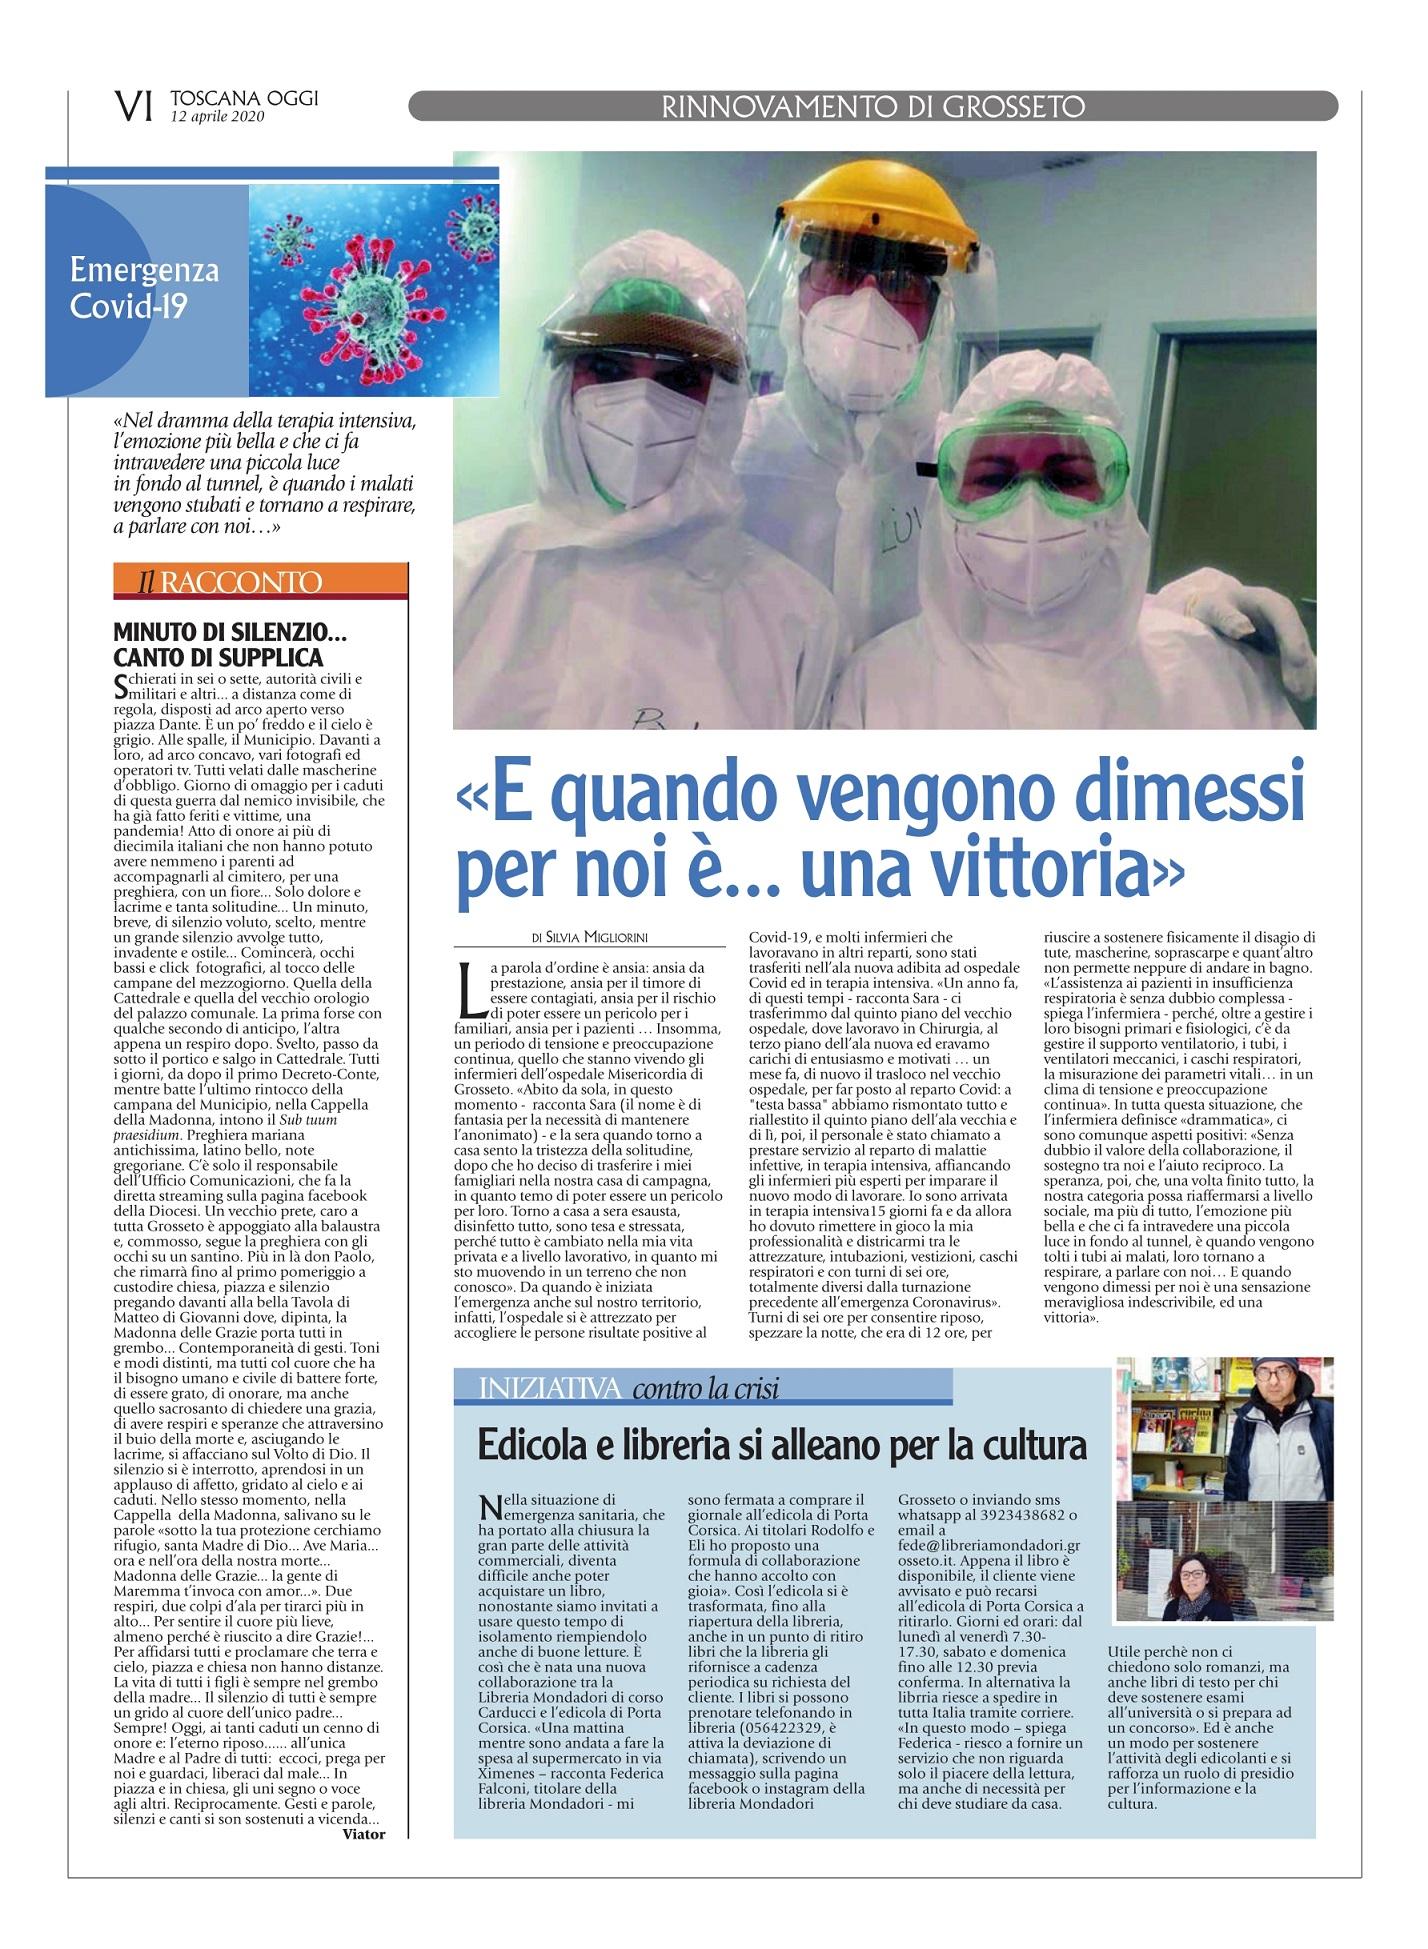 Toscana oggi coronavirus